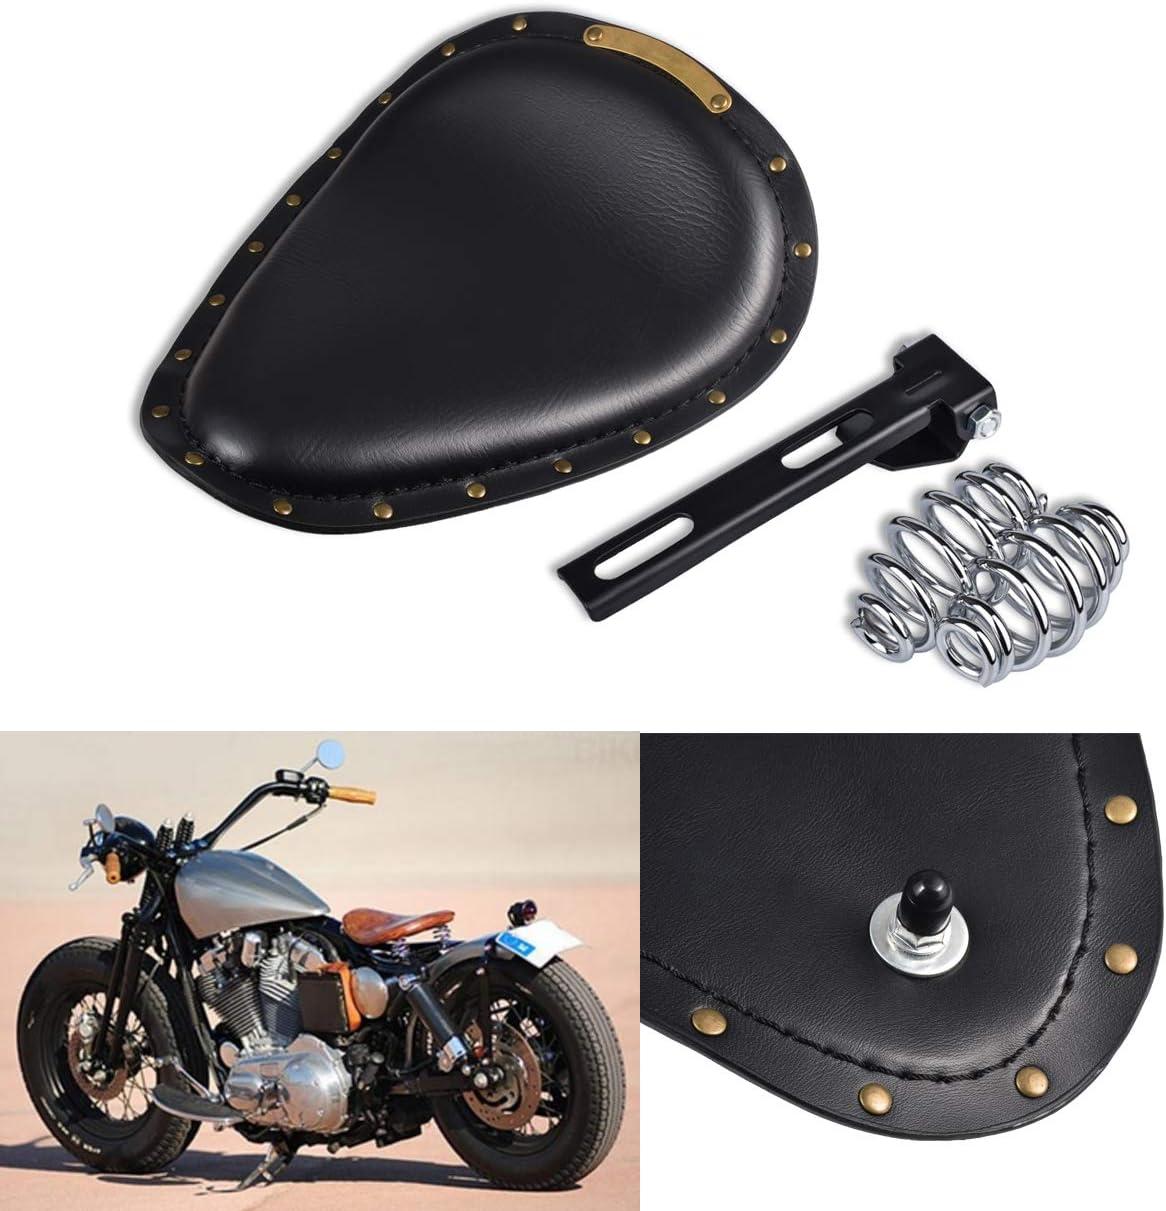 NATGIC Harley Motorrad Solo Sitzkissen Schwarz Krokodilleder Tasche f/ür Harley Sportster Bobber Chopper Custom